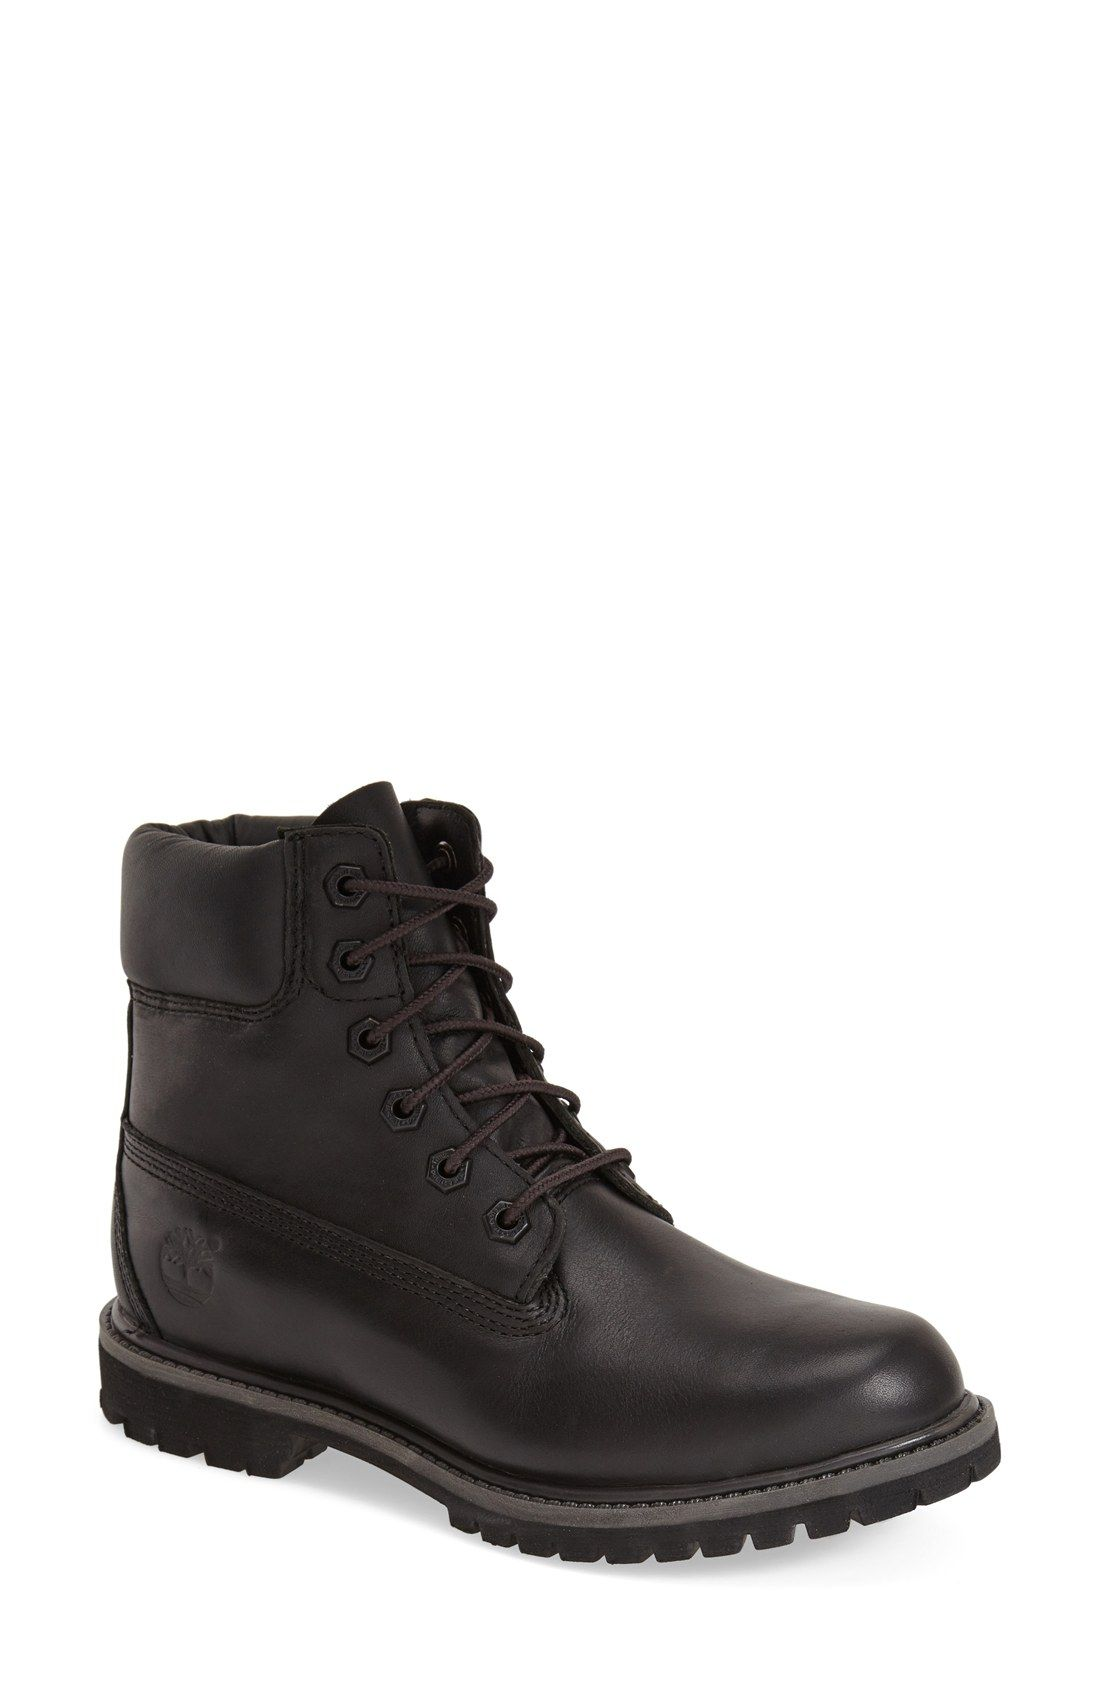 159 95 Timberland Earthkeepers 6 Inch Premium Waterproof Boot Women